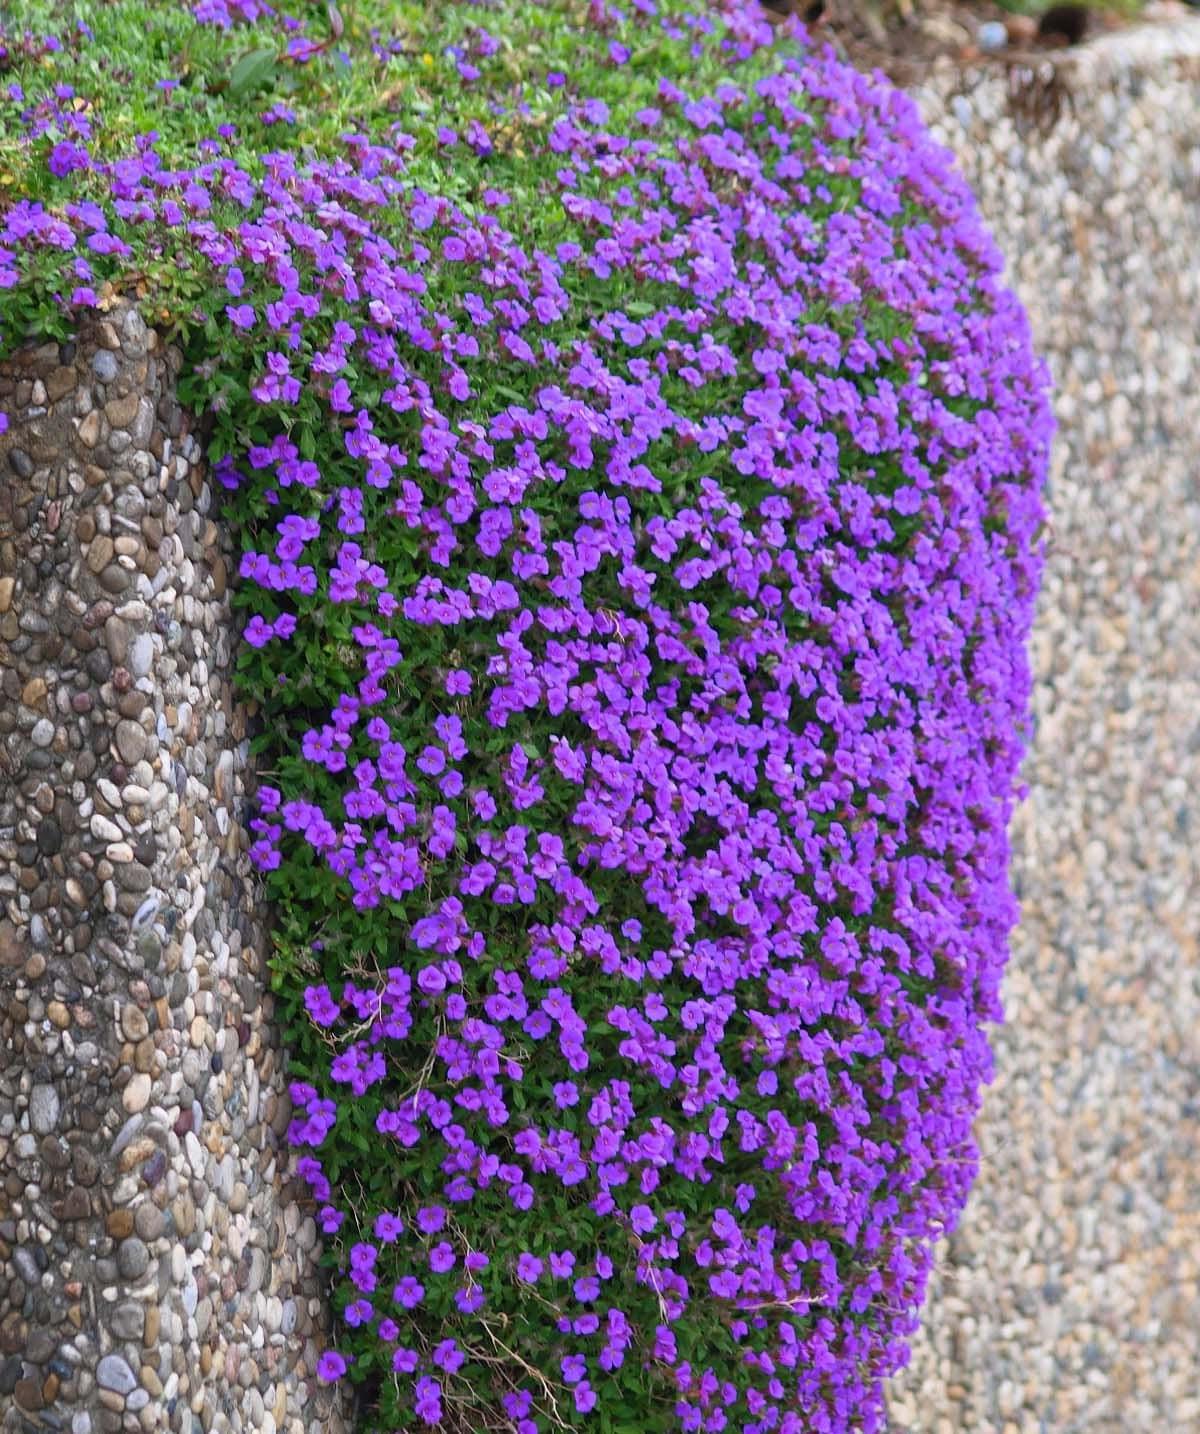 50 aubrieta seeds purple rockcress perennial groundcover for Purple flower ground cover perennial